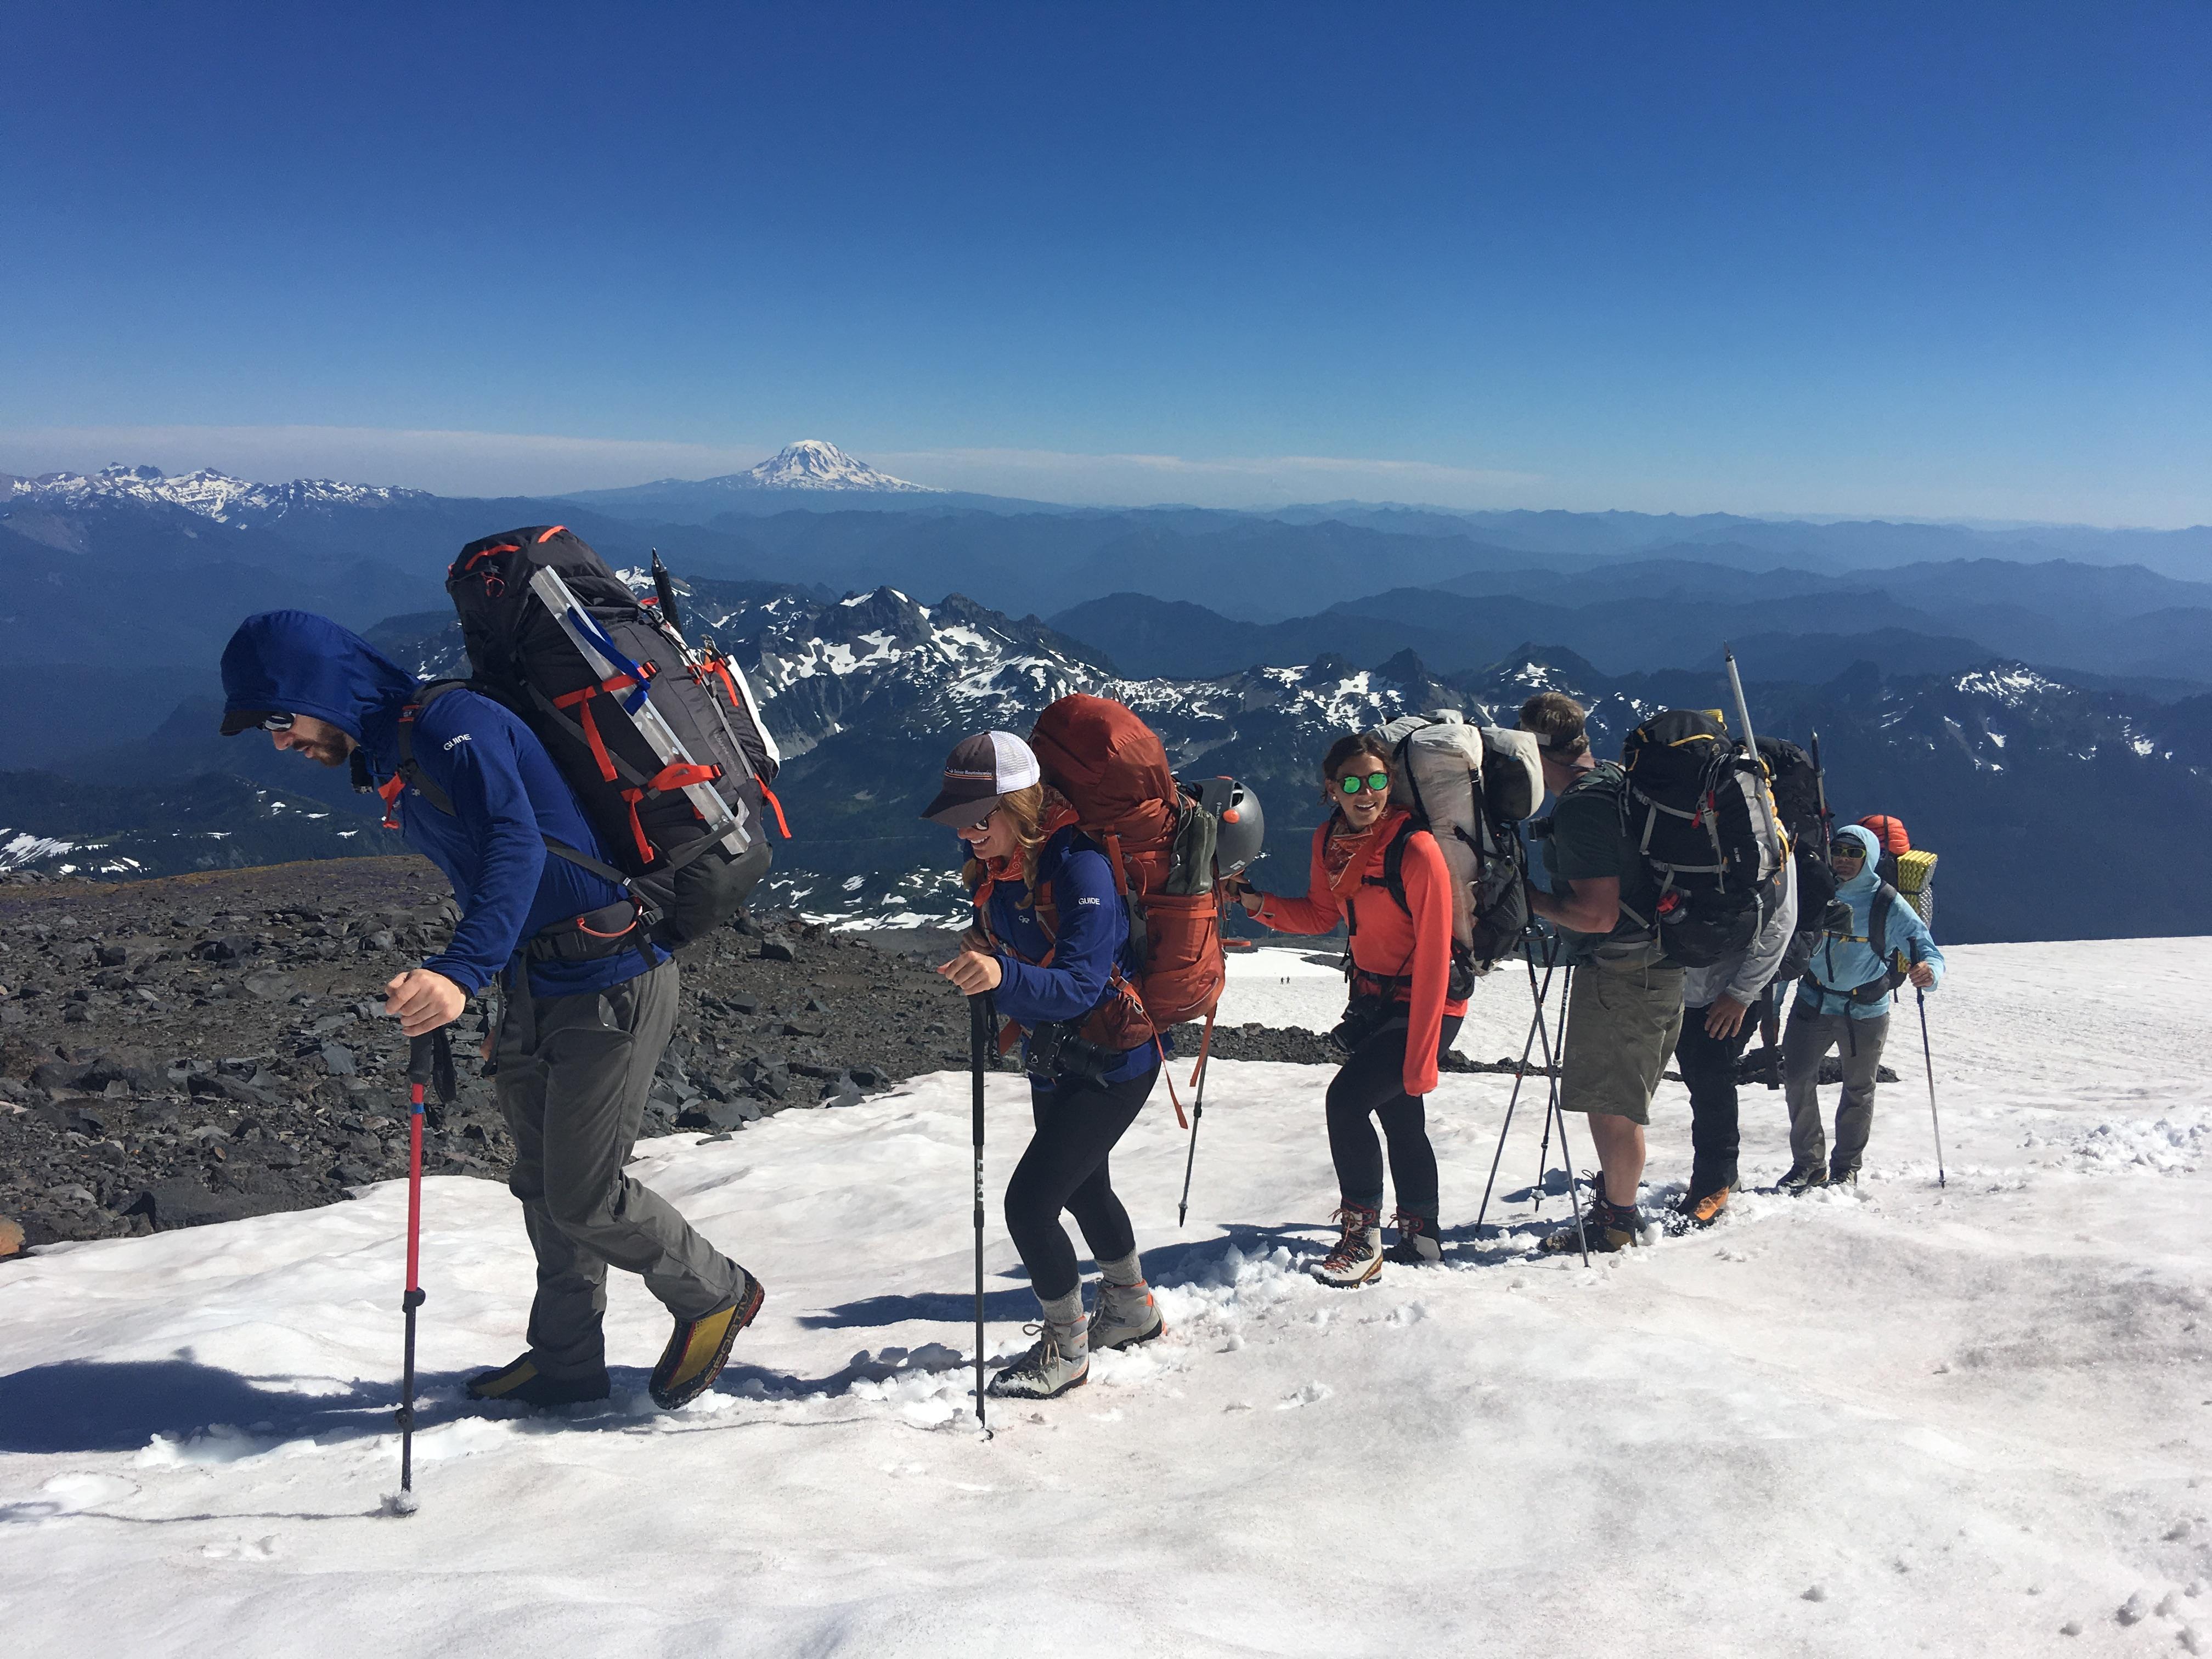 Climbing Muir Snowfield, Mount Rainier